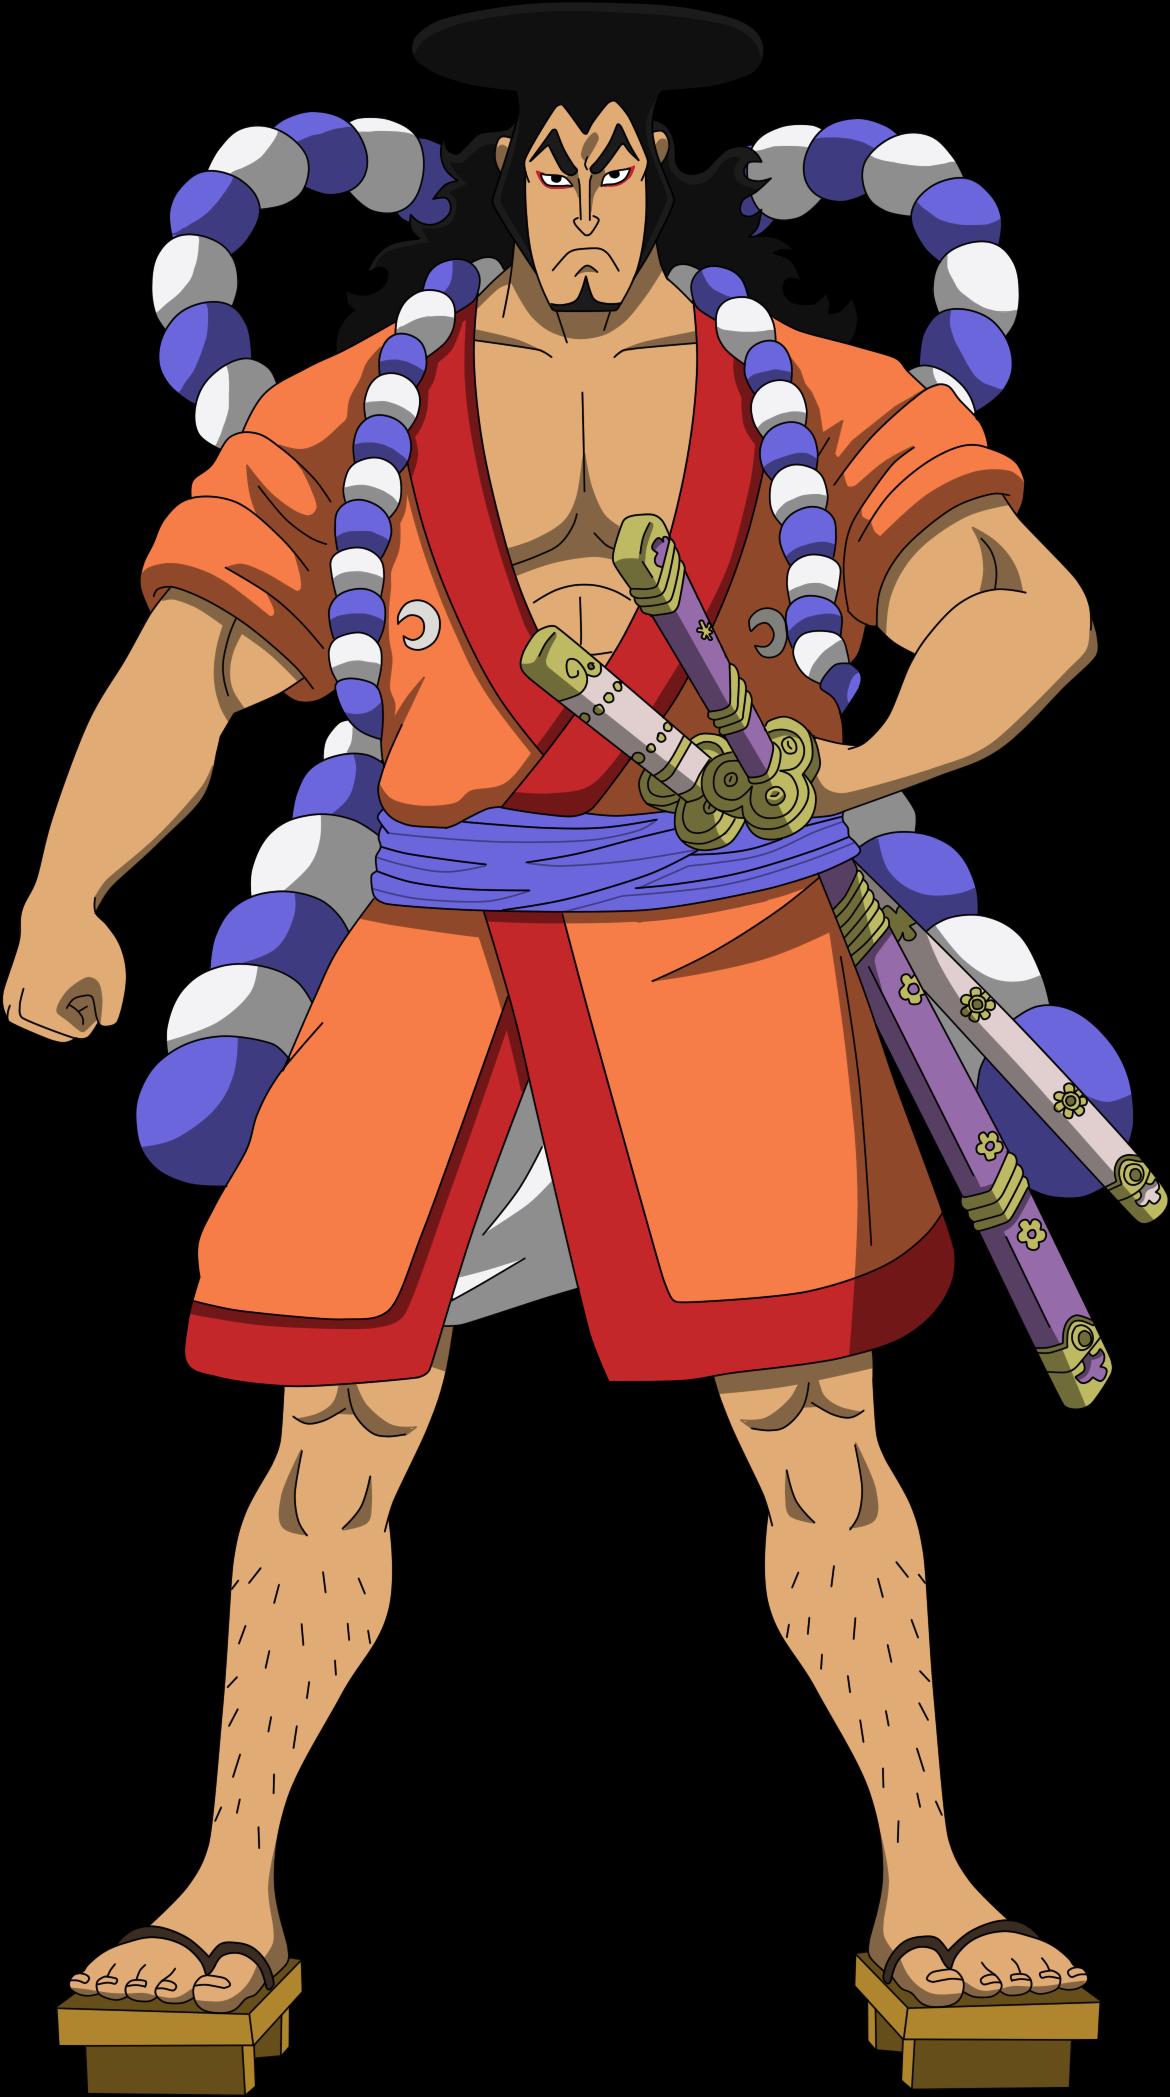 Kozuki Oden - One Piece Wano by caiquenadal on DeviantArt   One piece anime, One piece manga ...